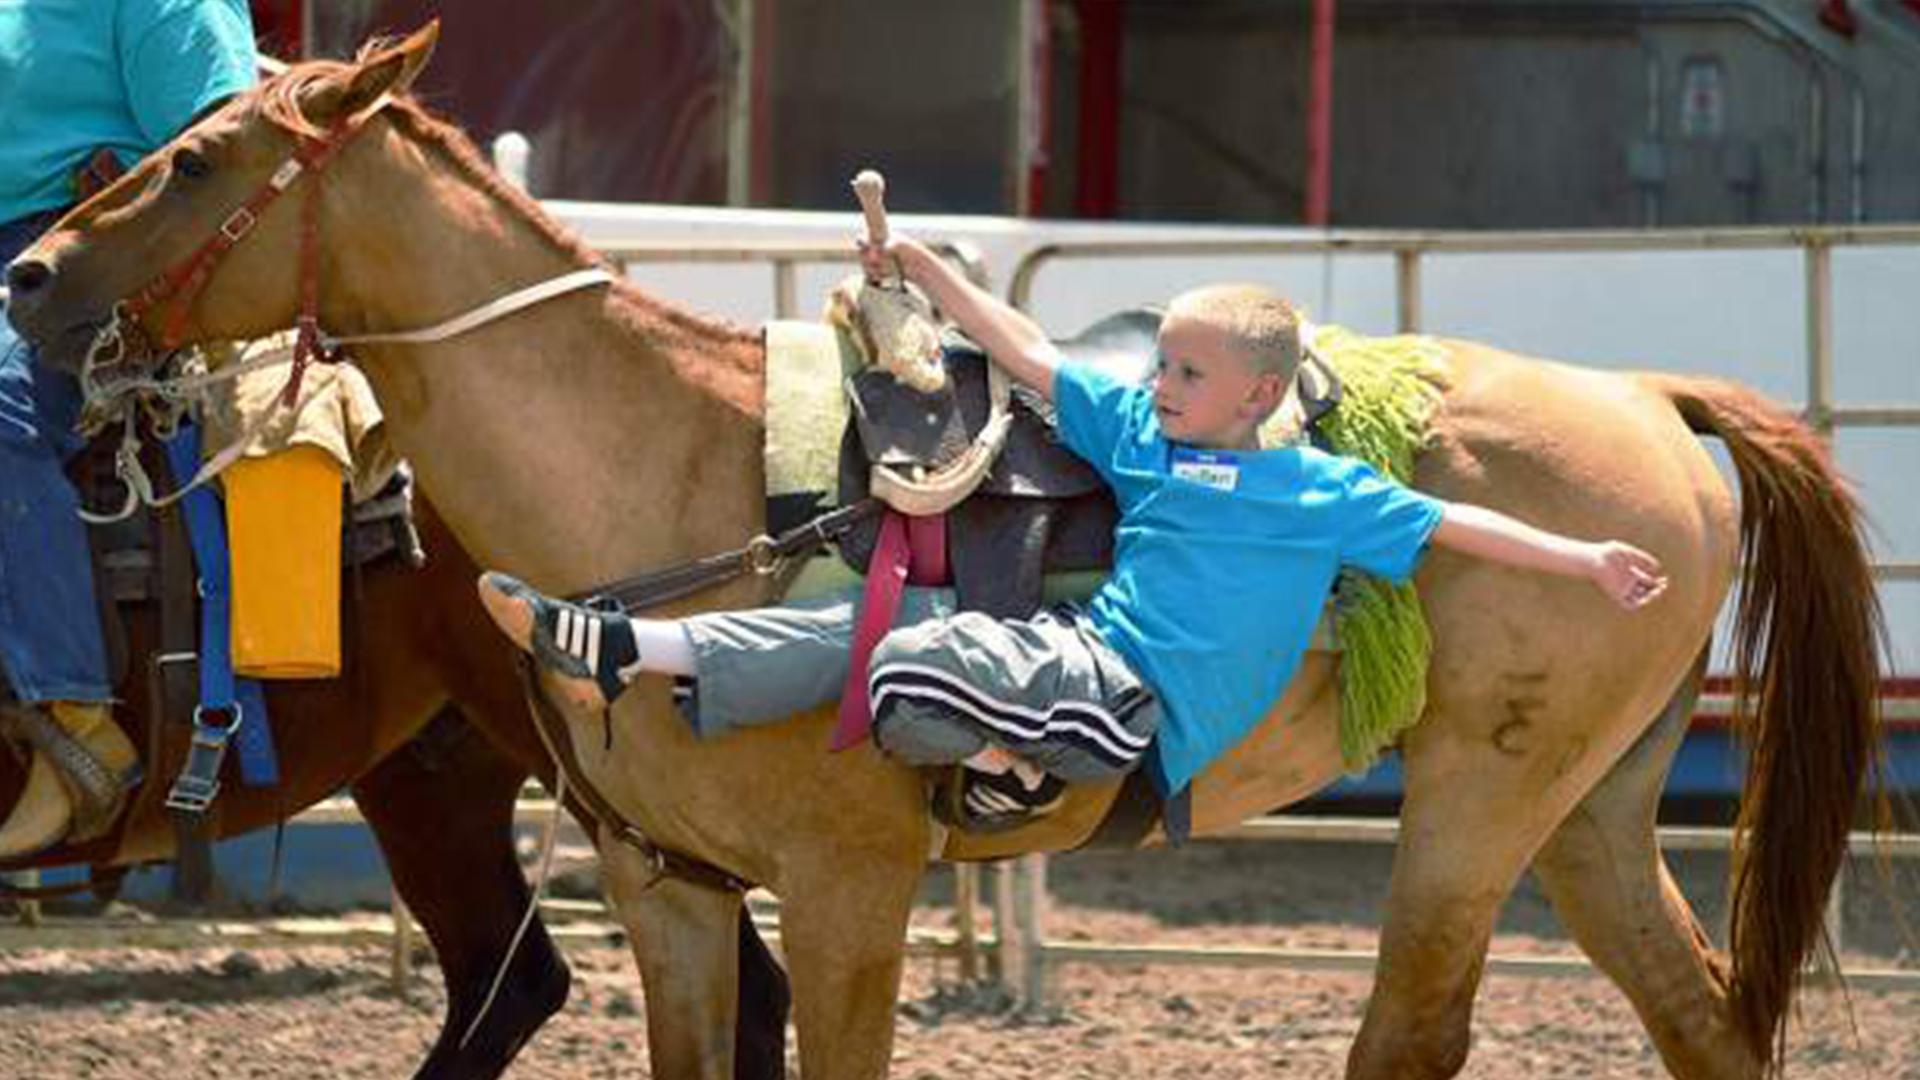 Rodeo Bible Camp (Colorado) -